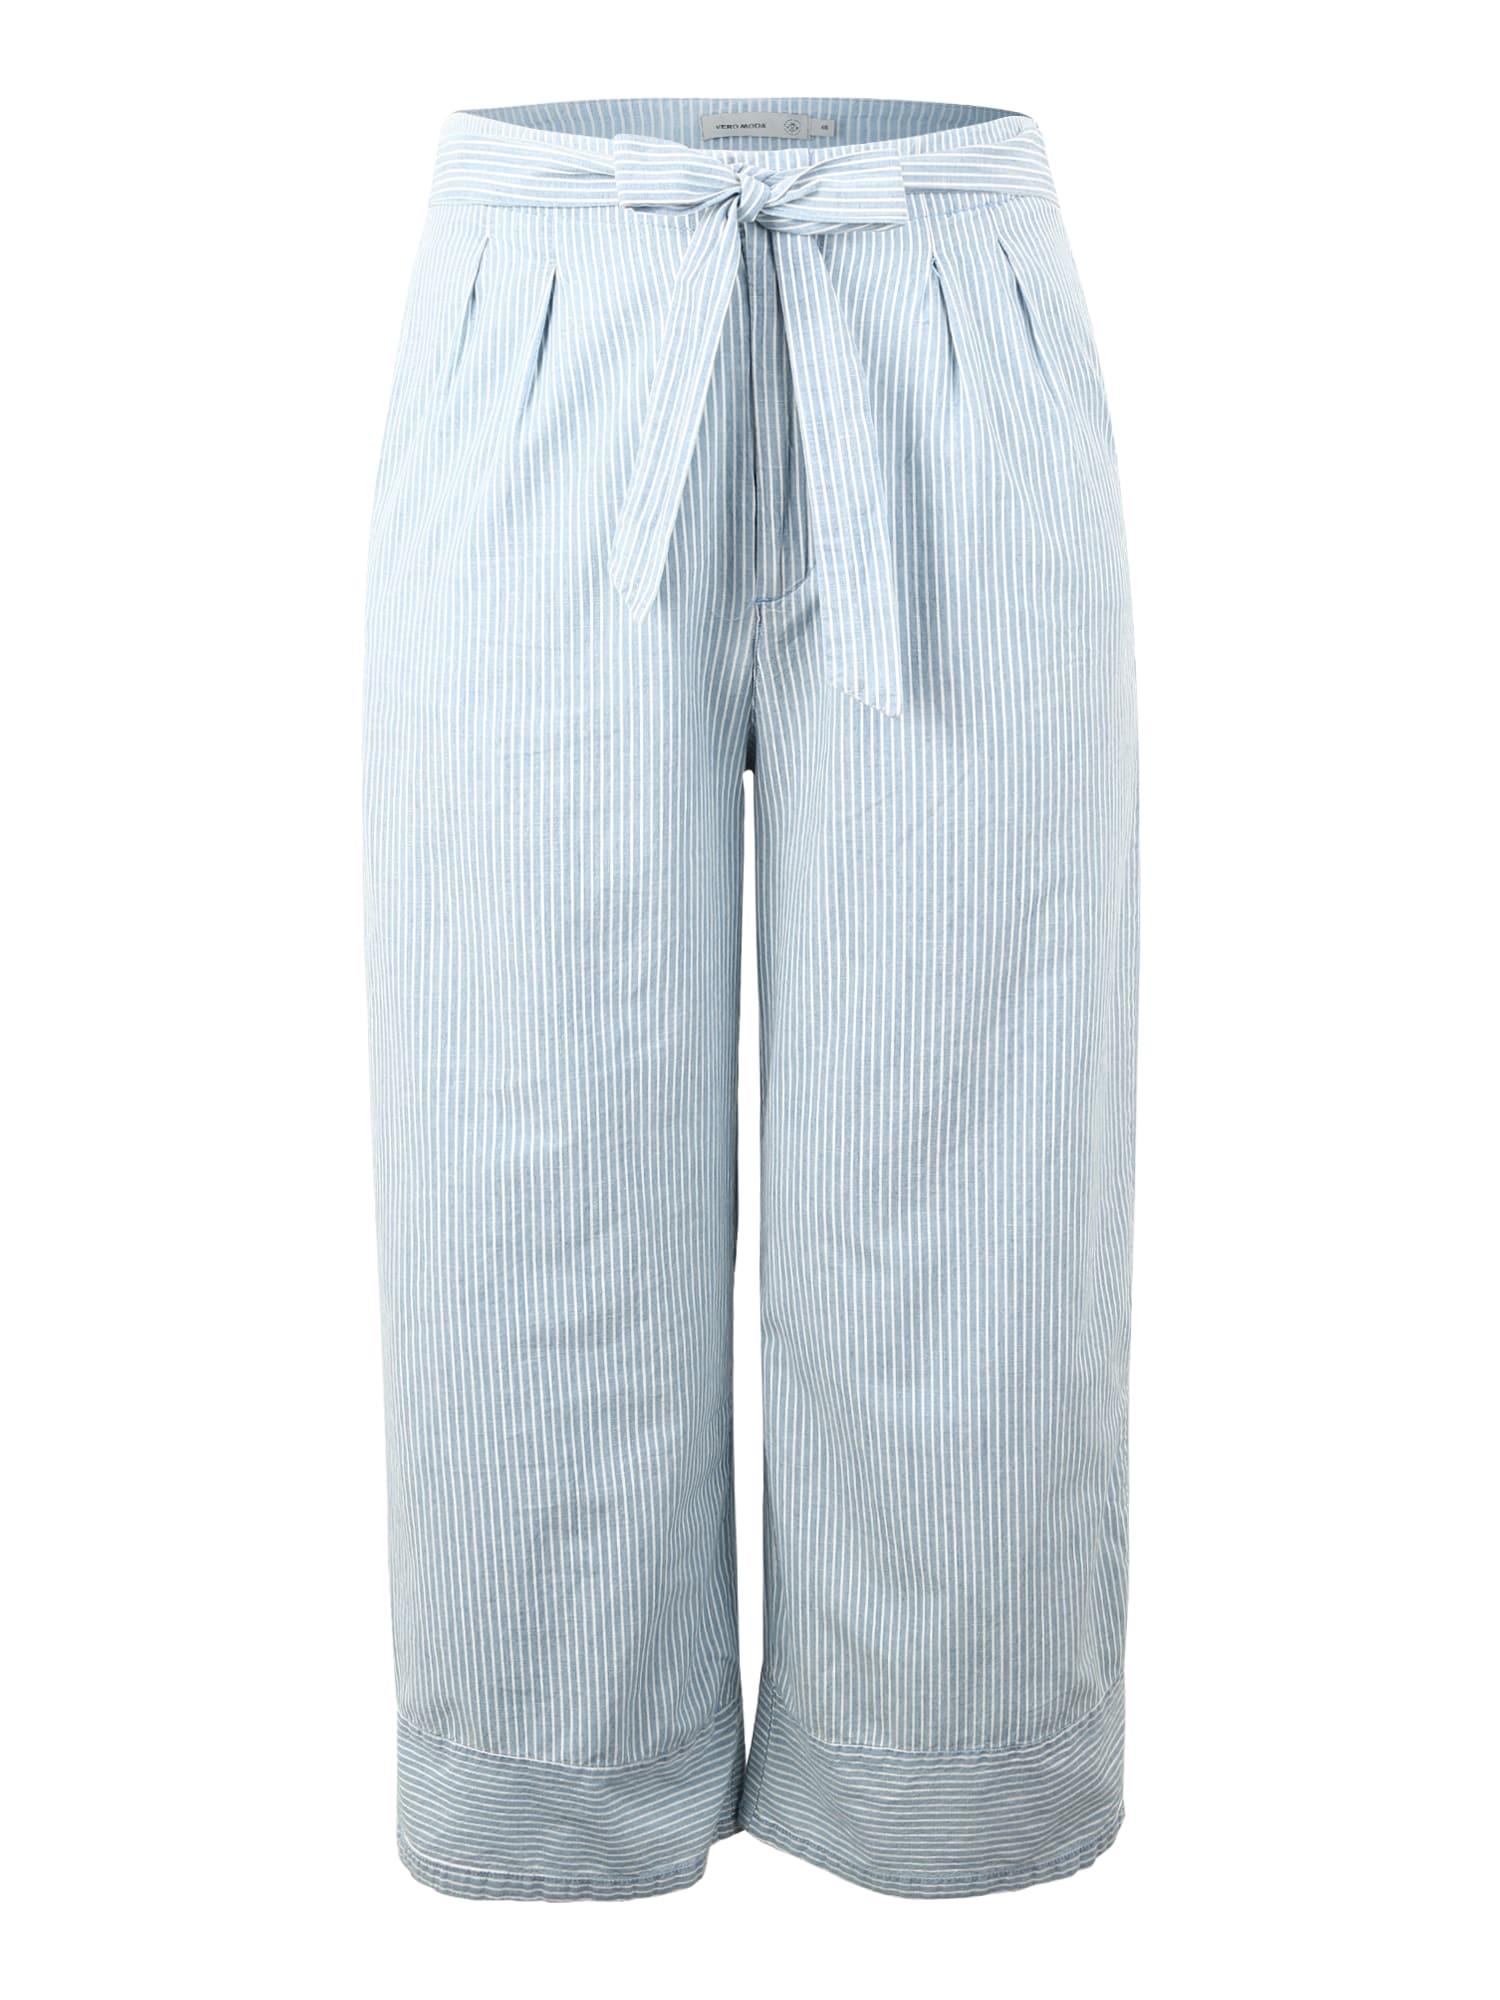 Kalhoty MIA světlemodrá bílá Vero Moda Curve